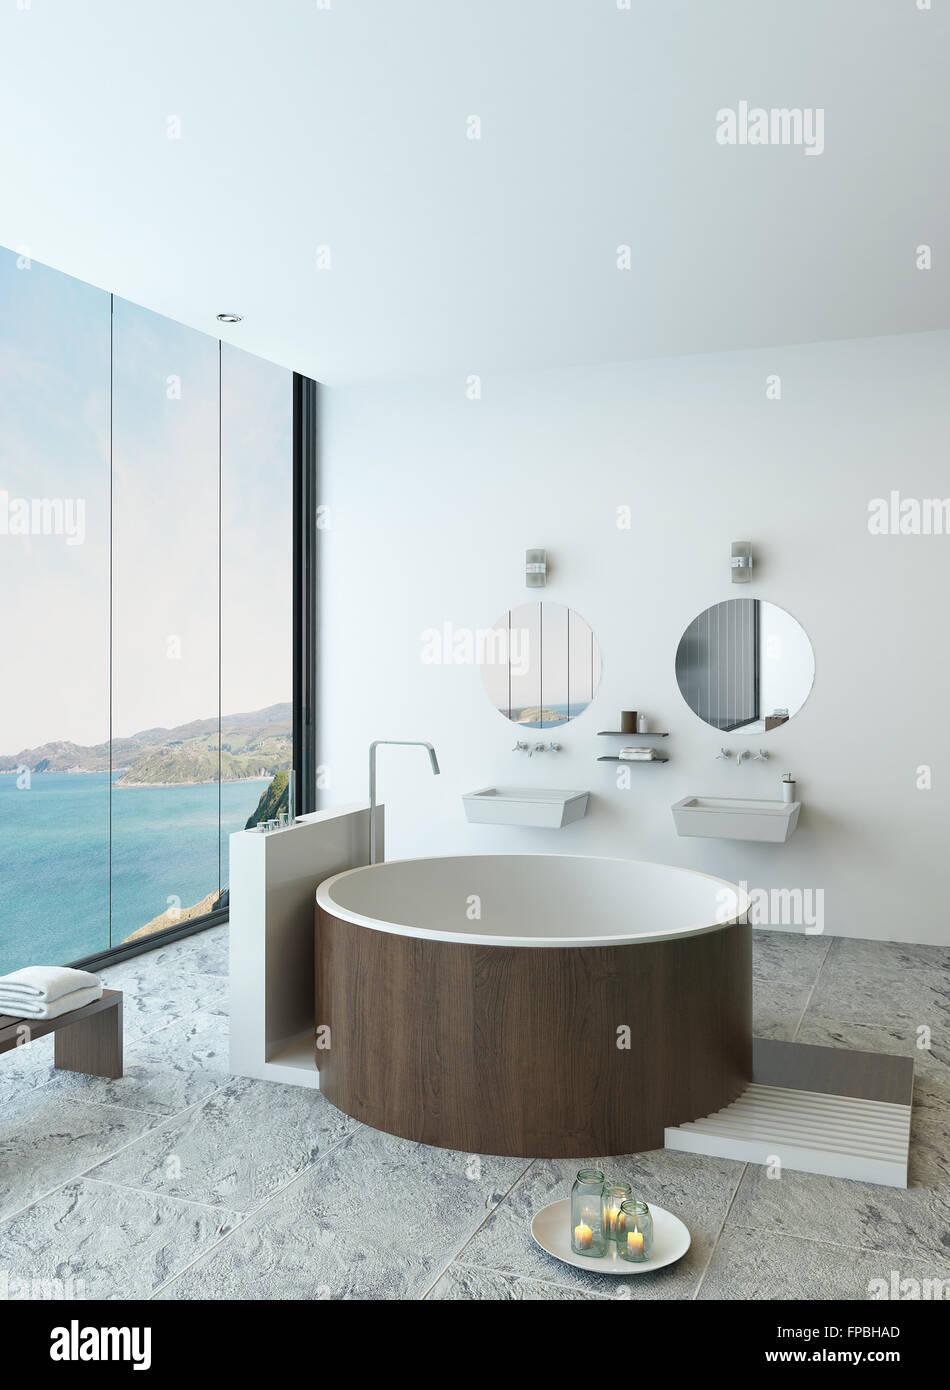 bathroom bathtub luxury design modern jacuzzi Stock Photo: 99829365 ...